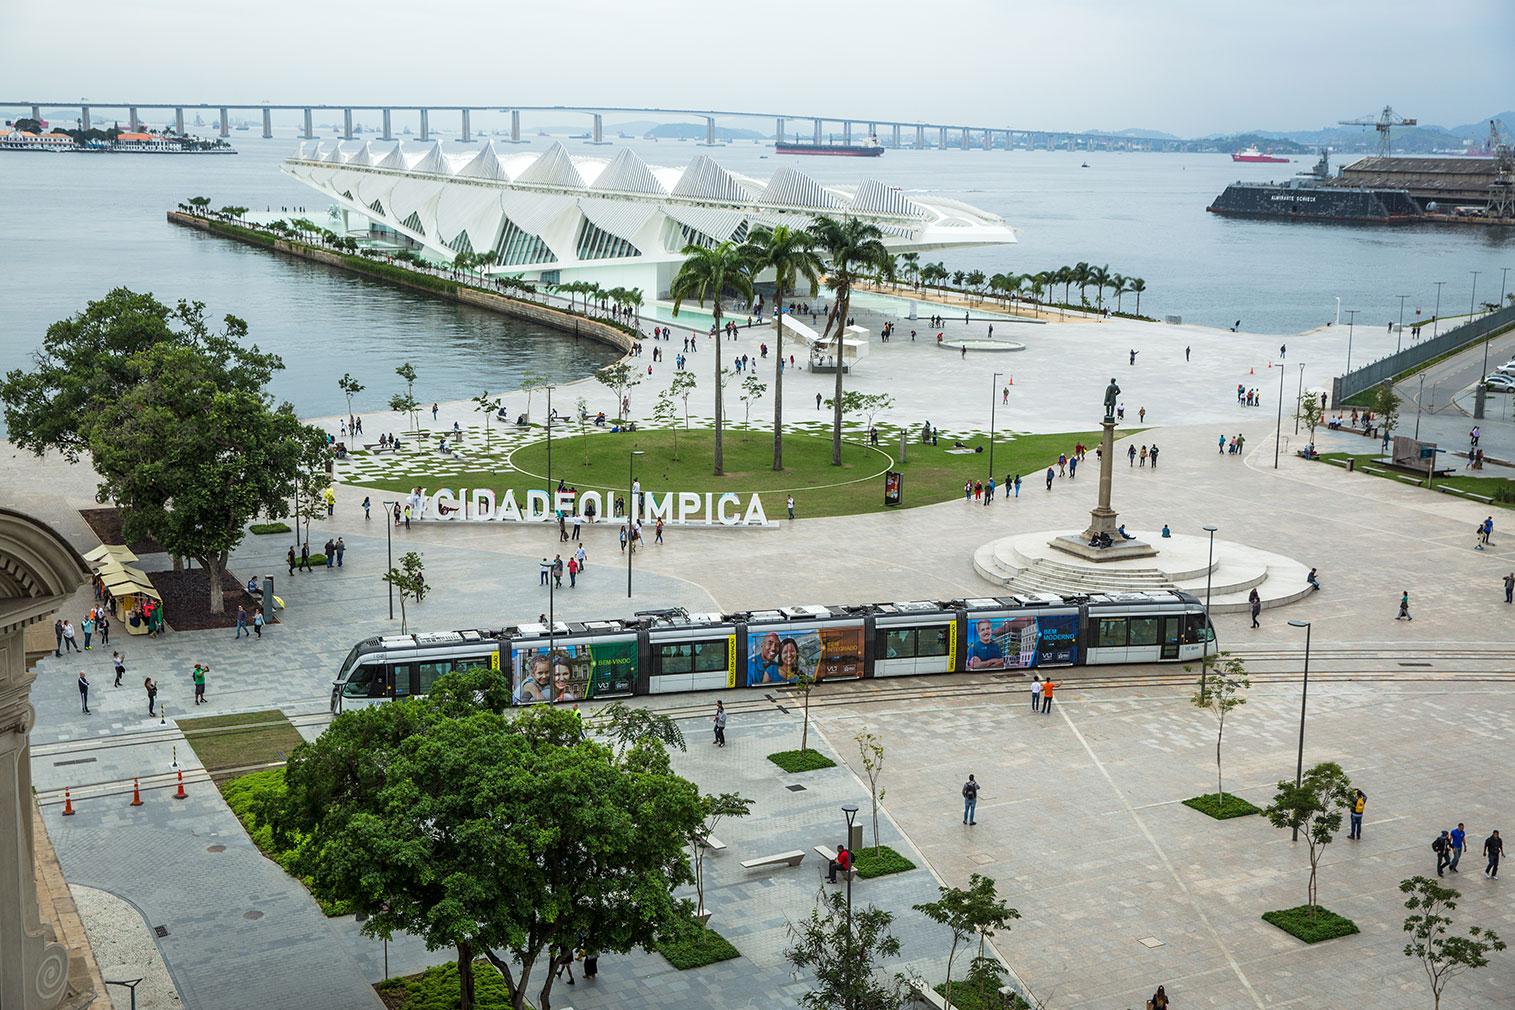 Casa Brasil at the Rio Olympic Games